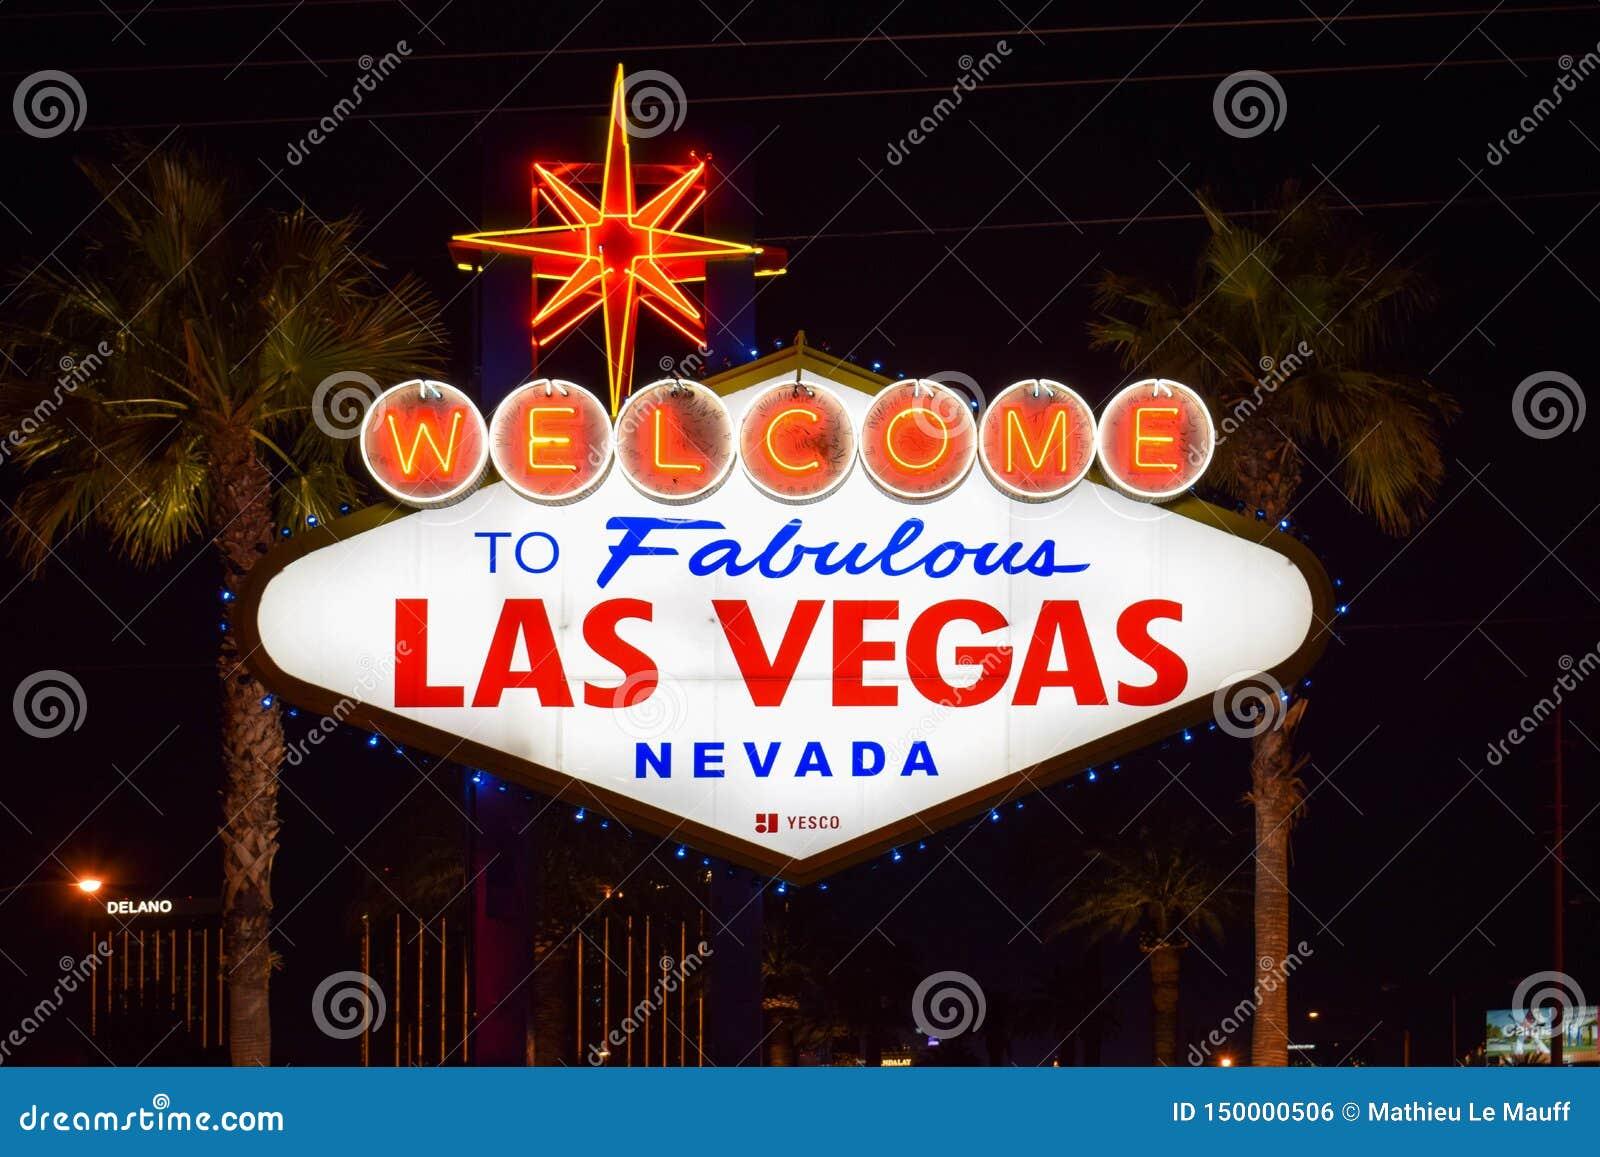 Recepci?n a Las Vegas fabuloso Nevada Sign